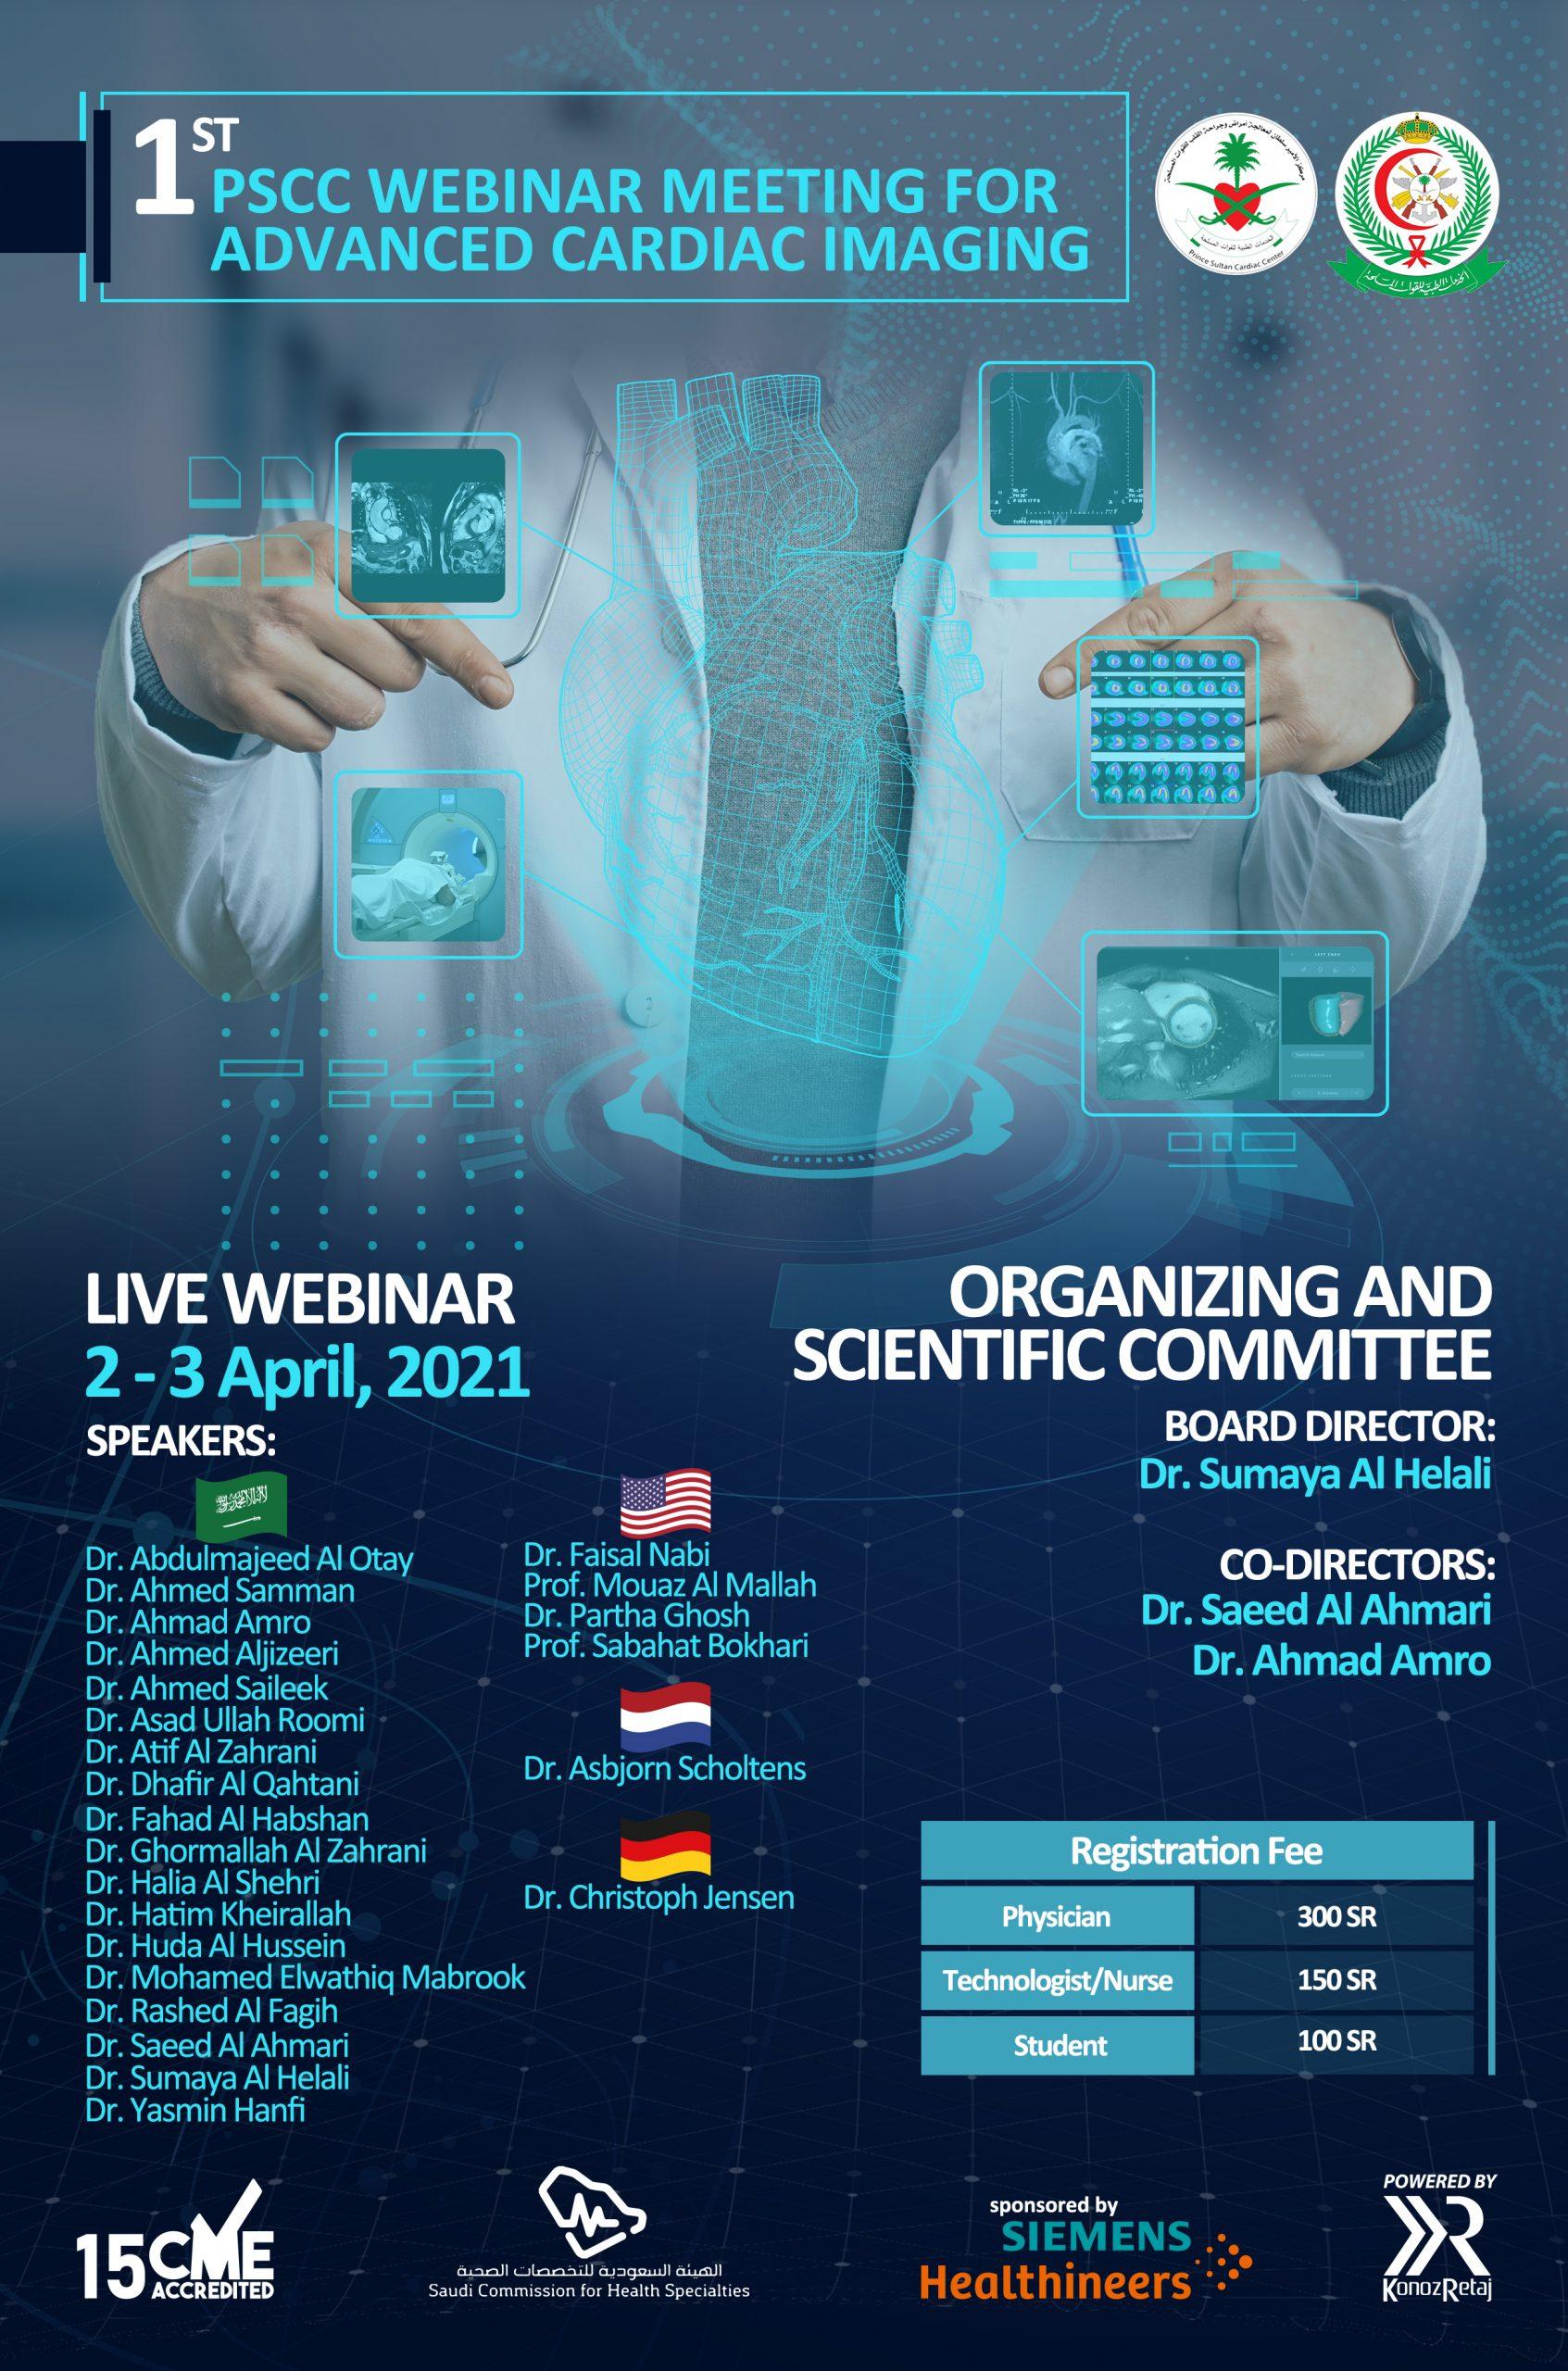 1st PSCC Webinar Meeting For Advanced Cardiac Imaging